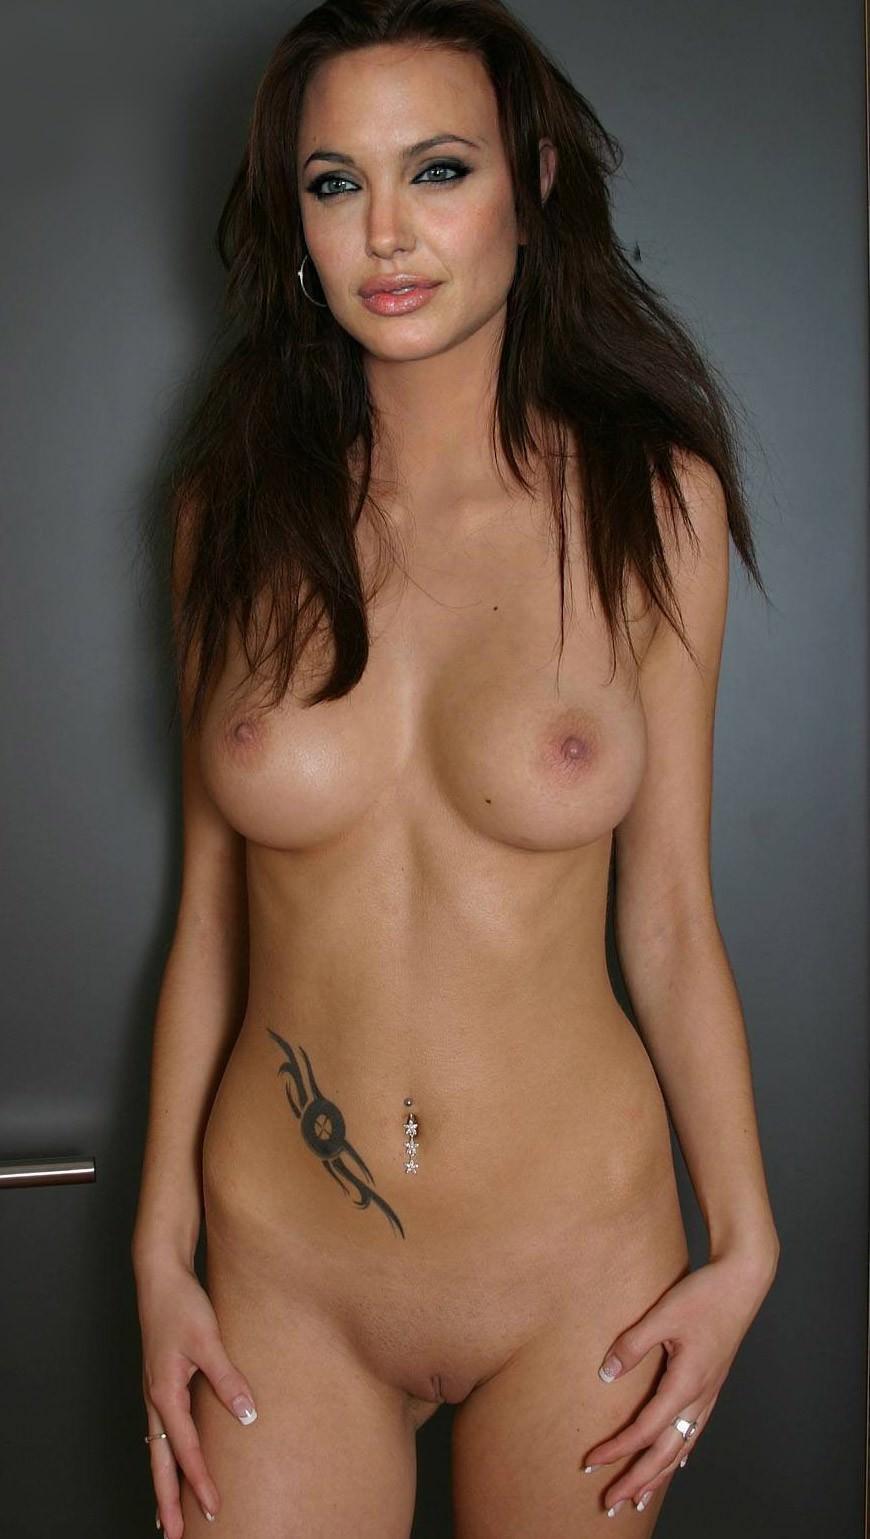 Angelina jolie naked free, wife likes anal vibrator